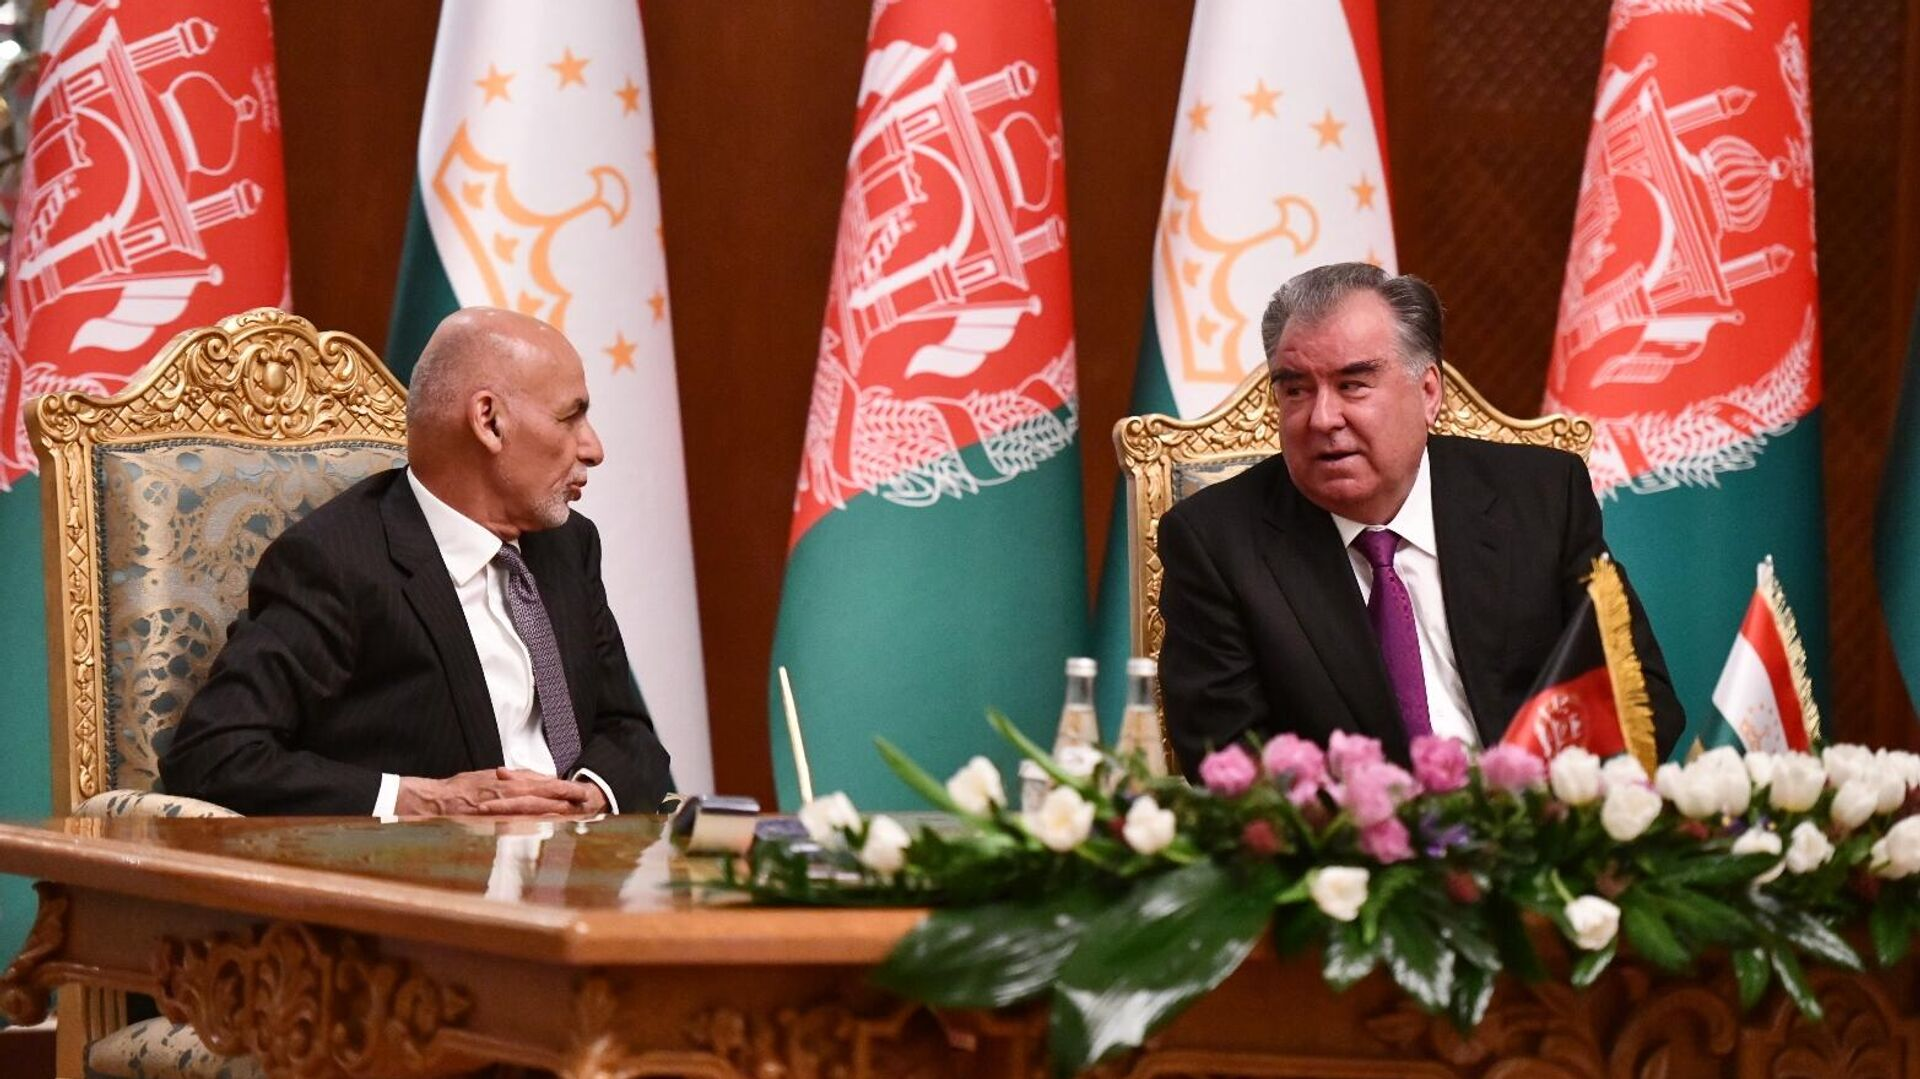 Президент Таджикистана Эмомали Рахмон (справа) и президент Афганистана Мухаммад Ашраф Гани - Sputnik Узбекистан, 1920, 31.03.2021